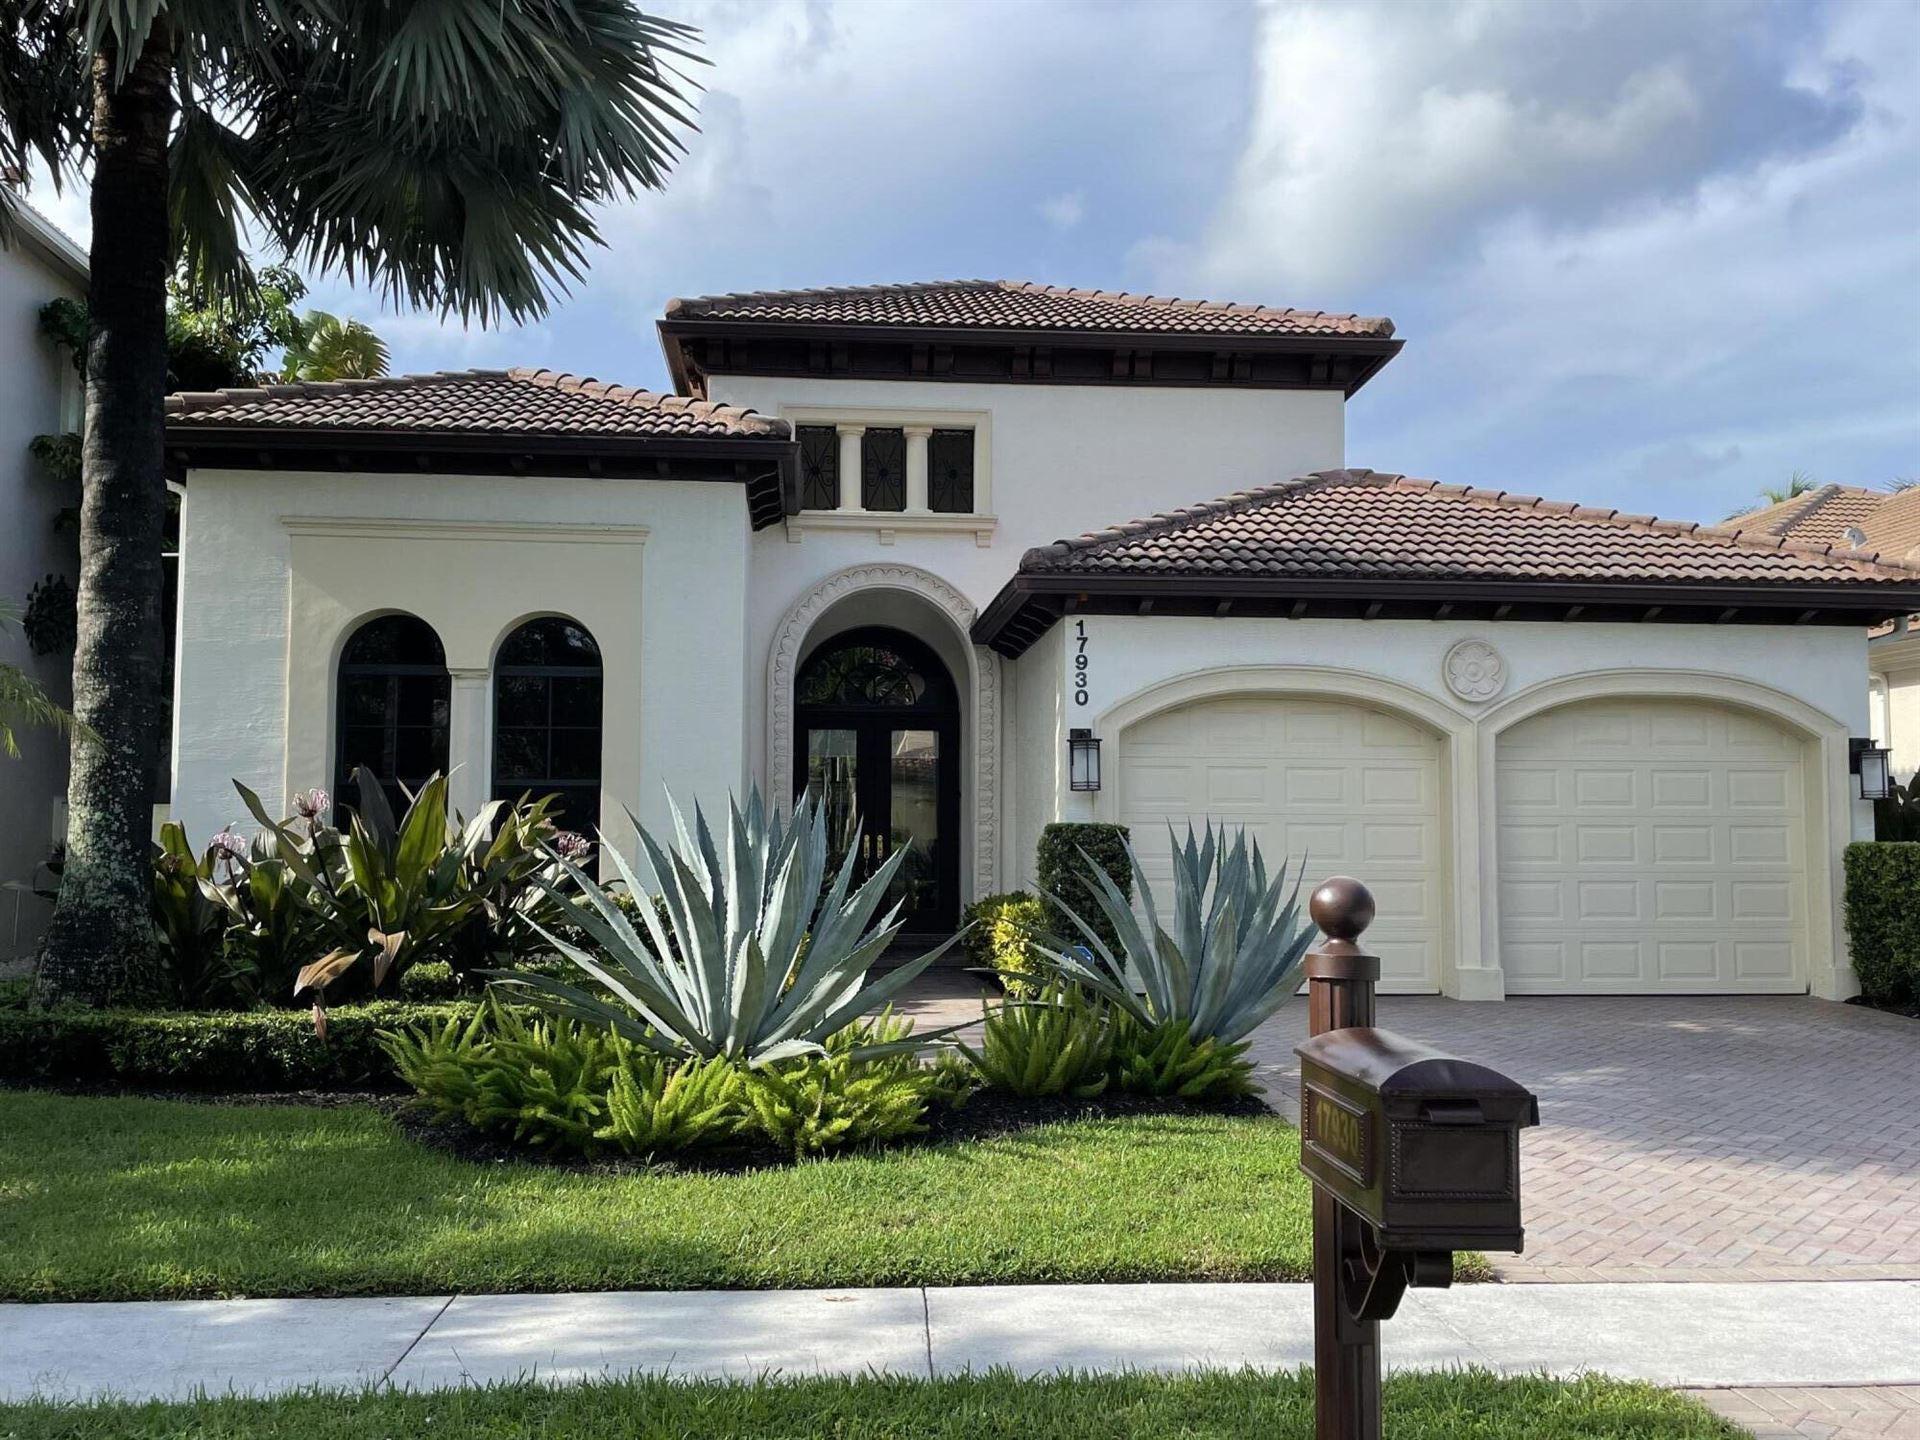 17930 Lake Azure Way, Boca Raton, FL 33496 - MLS#: RX-10735779